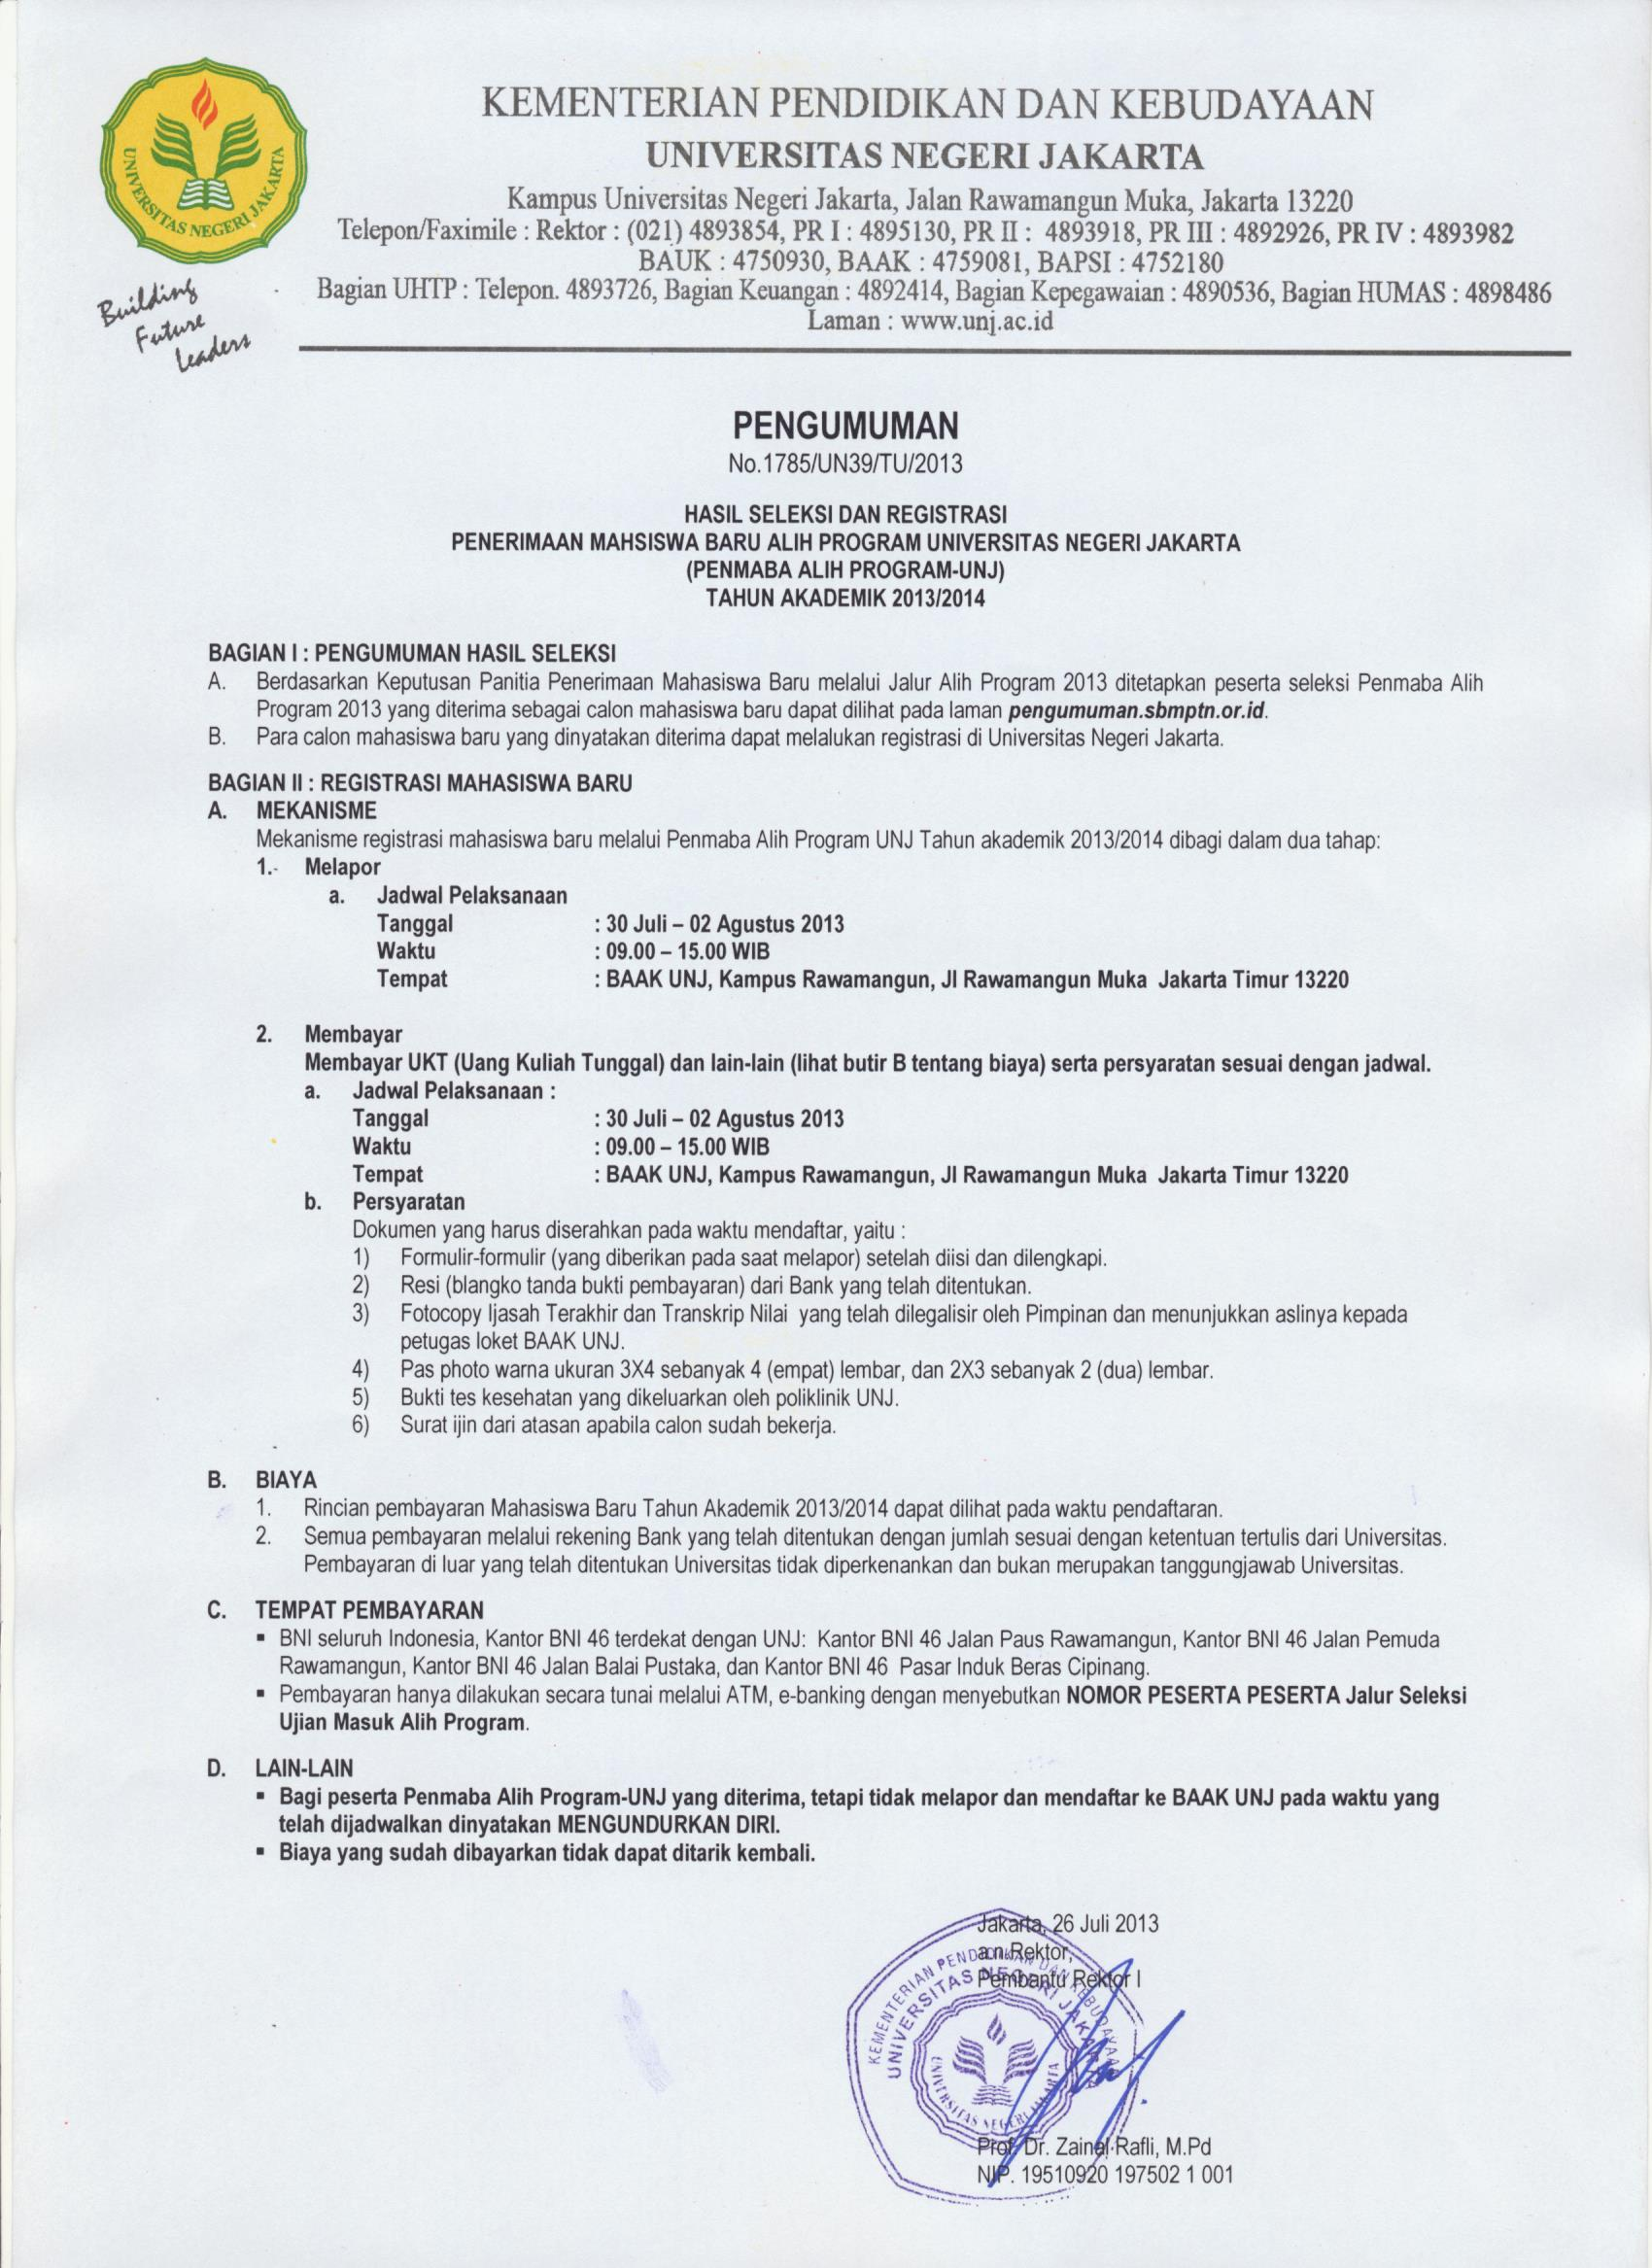 Pengumuman Penmaba (Jalur MANDIRI) Alih Program UNJ Tahun 2013/2014